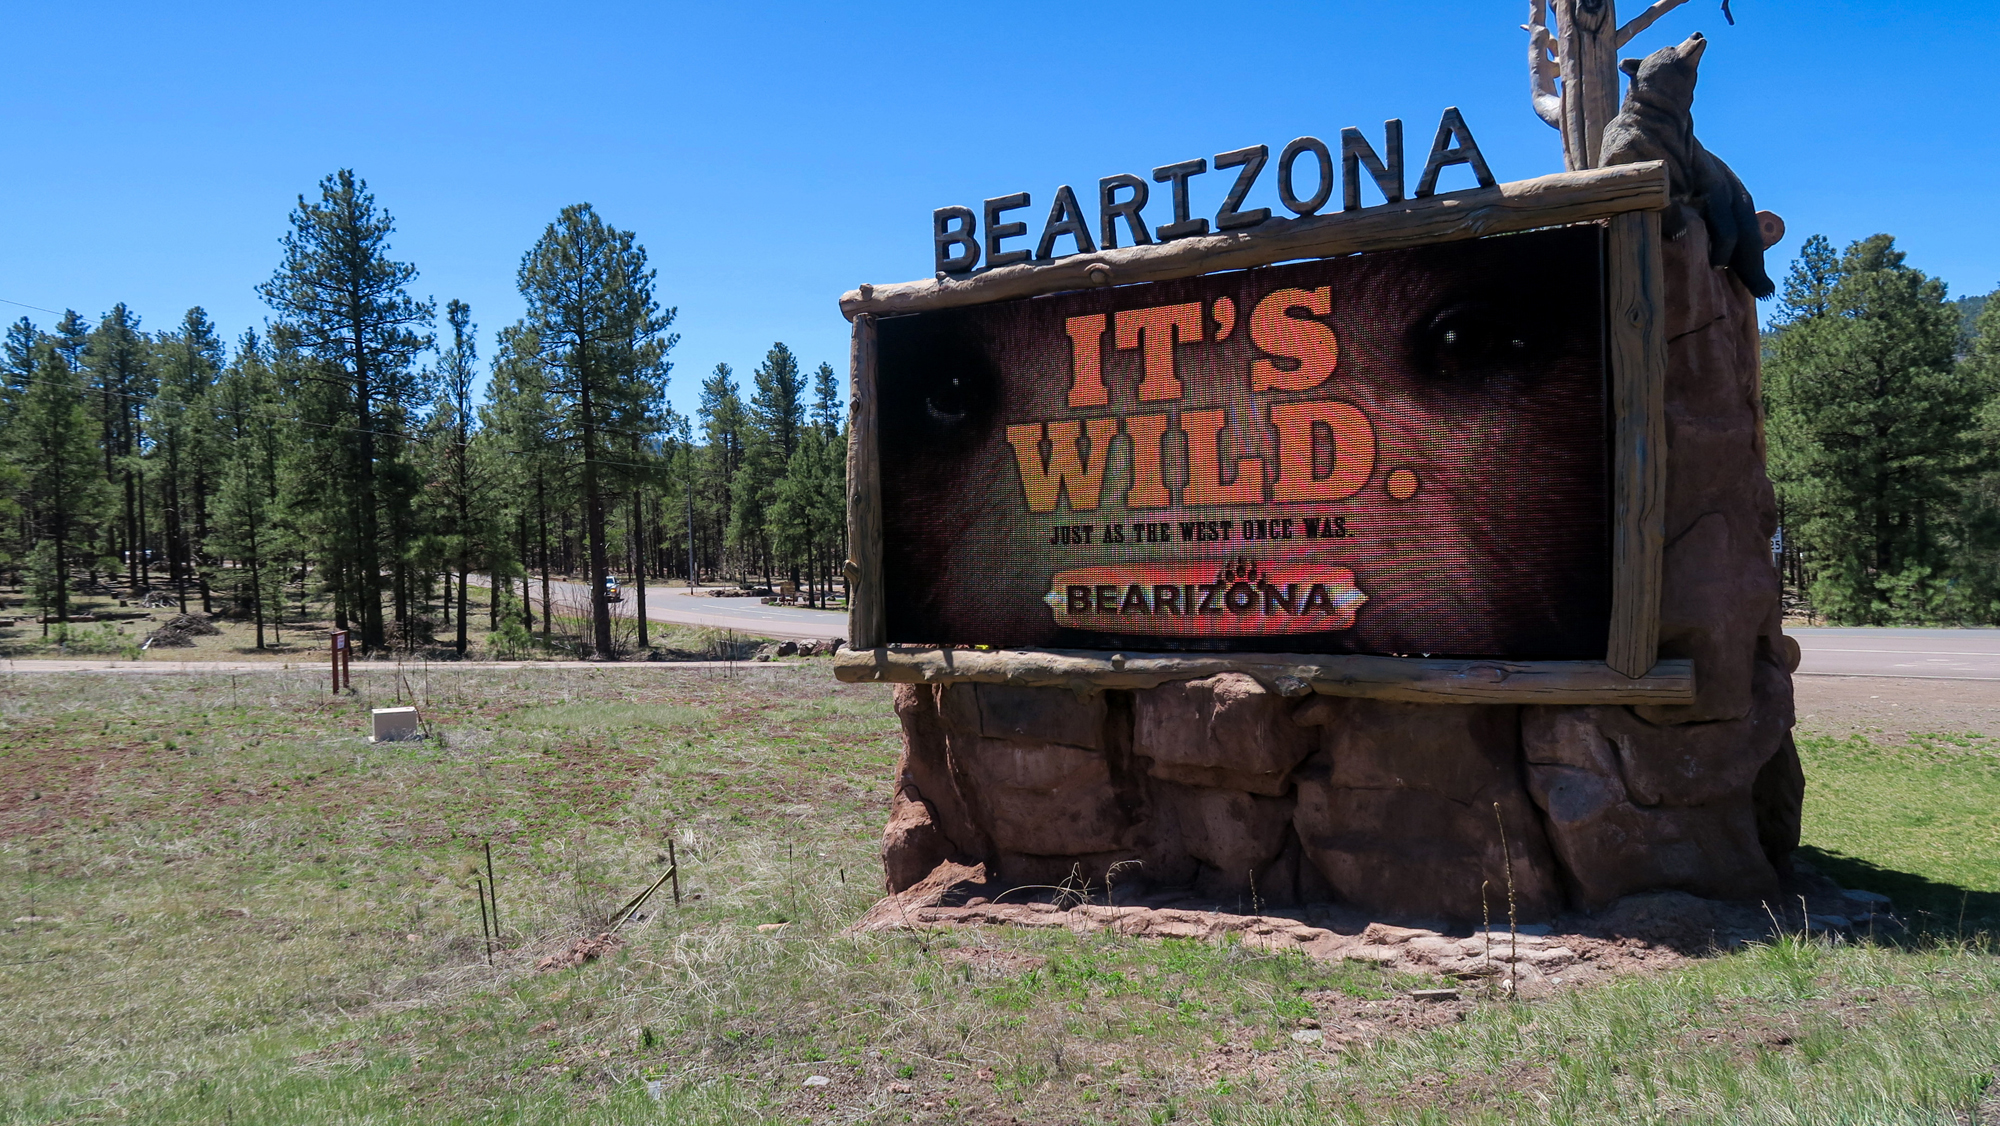 Bearizona Wild Animal Park in Williams Arizona